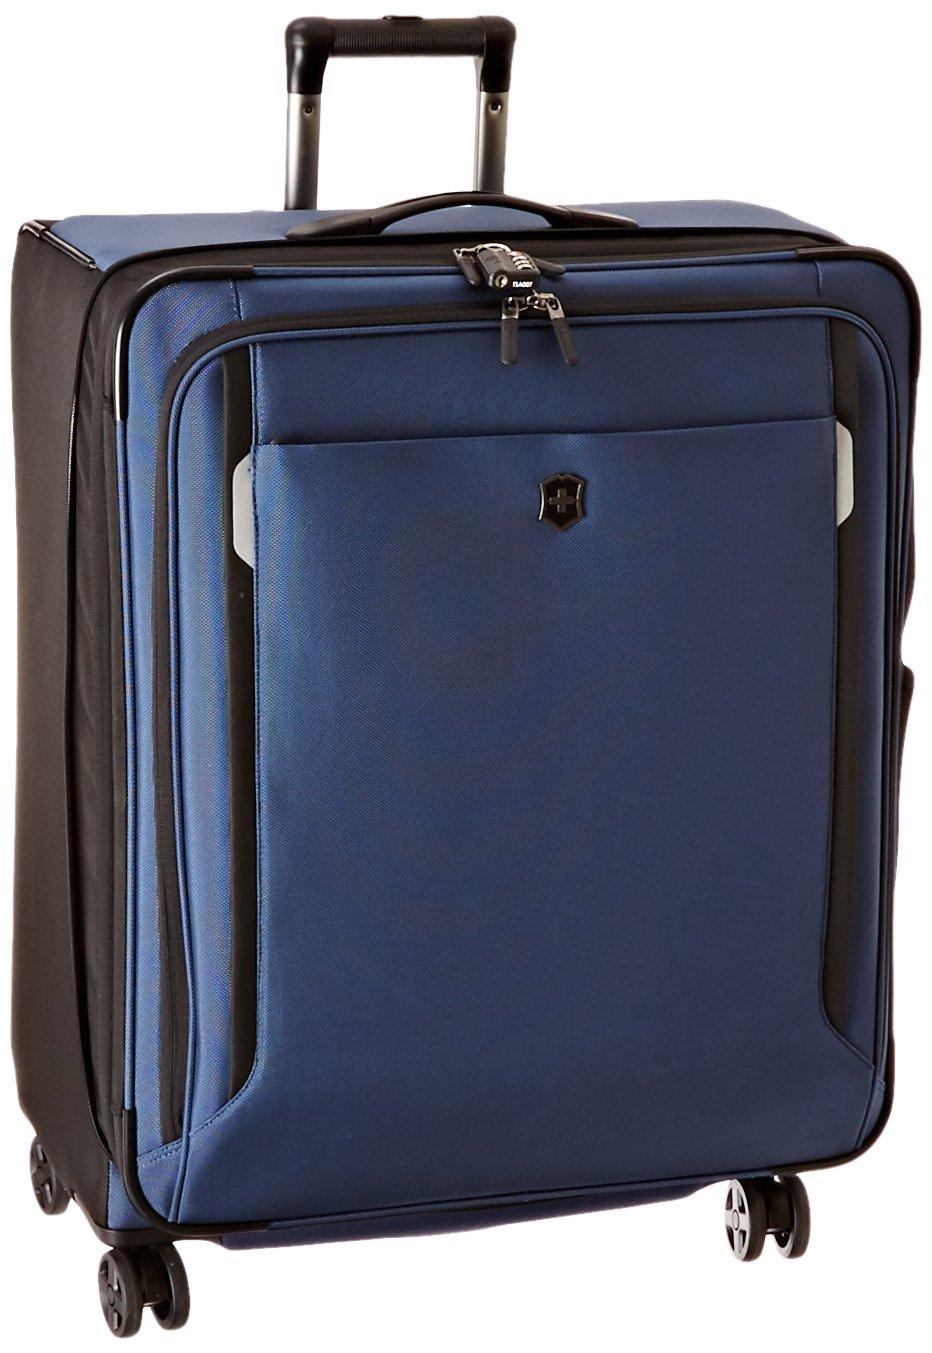 Victorinox Werks Traveler 5.0 WT 27 Dual-Caster, Navy Blue, One Size